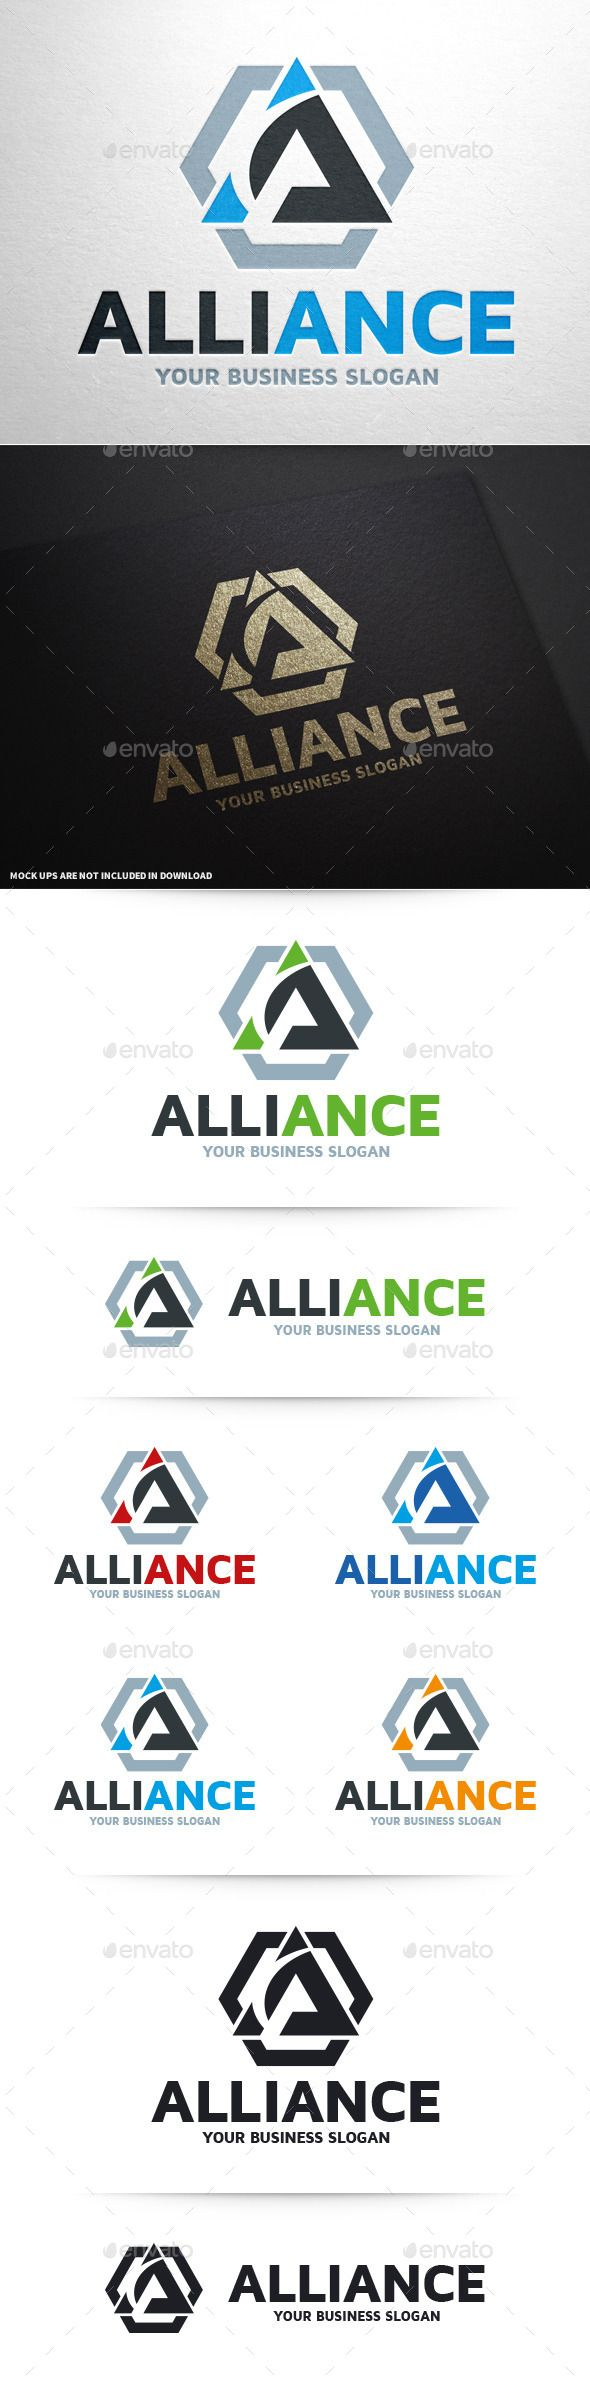 Alliance  Letter A Logo — Vector EPS #letter #web • Available here → https://graphicriver.net/item/alliance-letter-a-logo/10415690?ref=pxcr